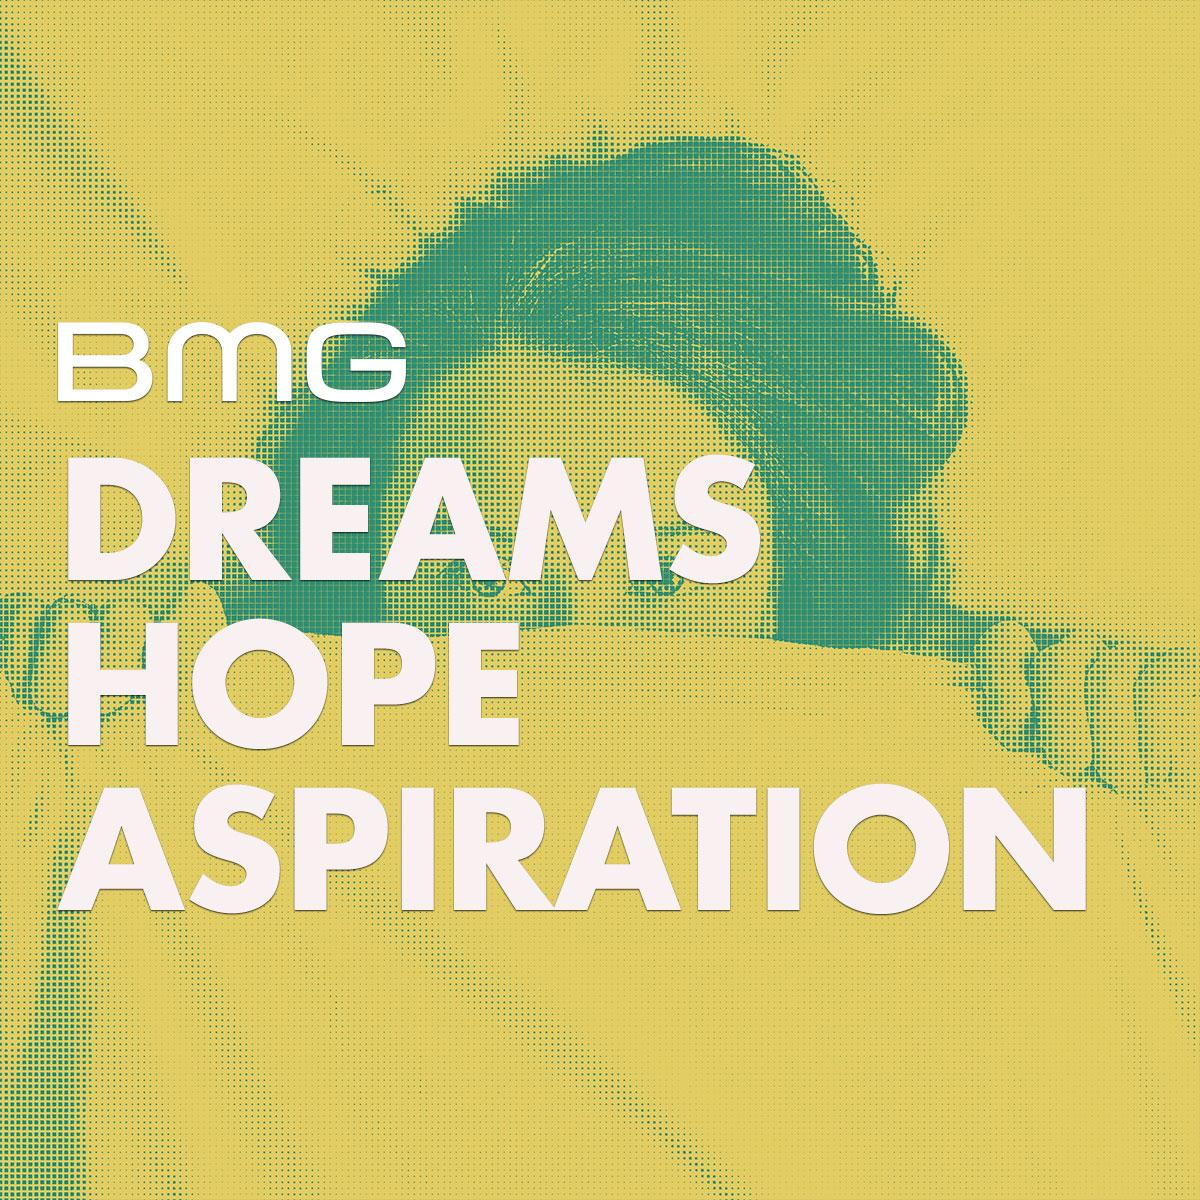 1200-x-1200-Dreams-Hope-Aspiratiojn.jpg